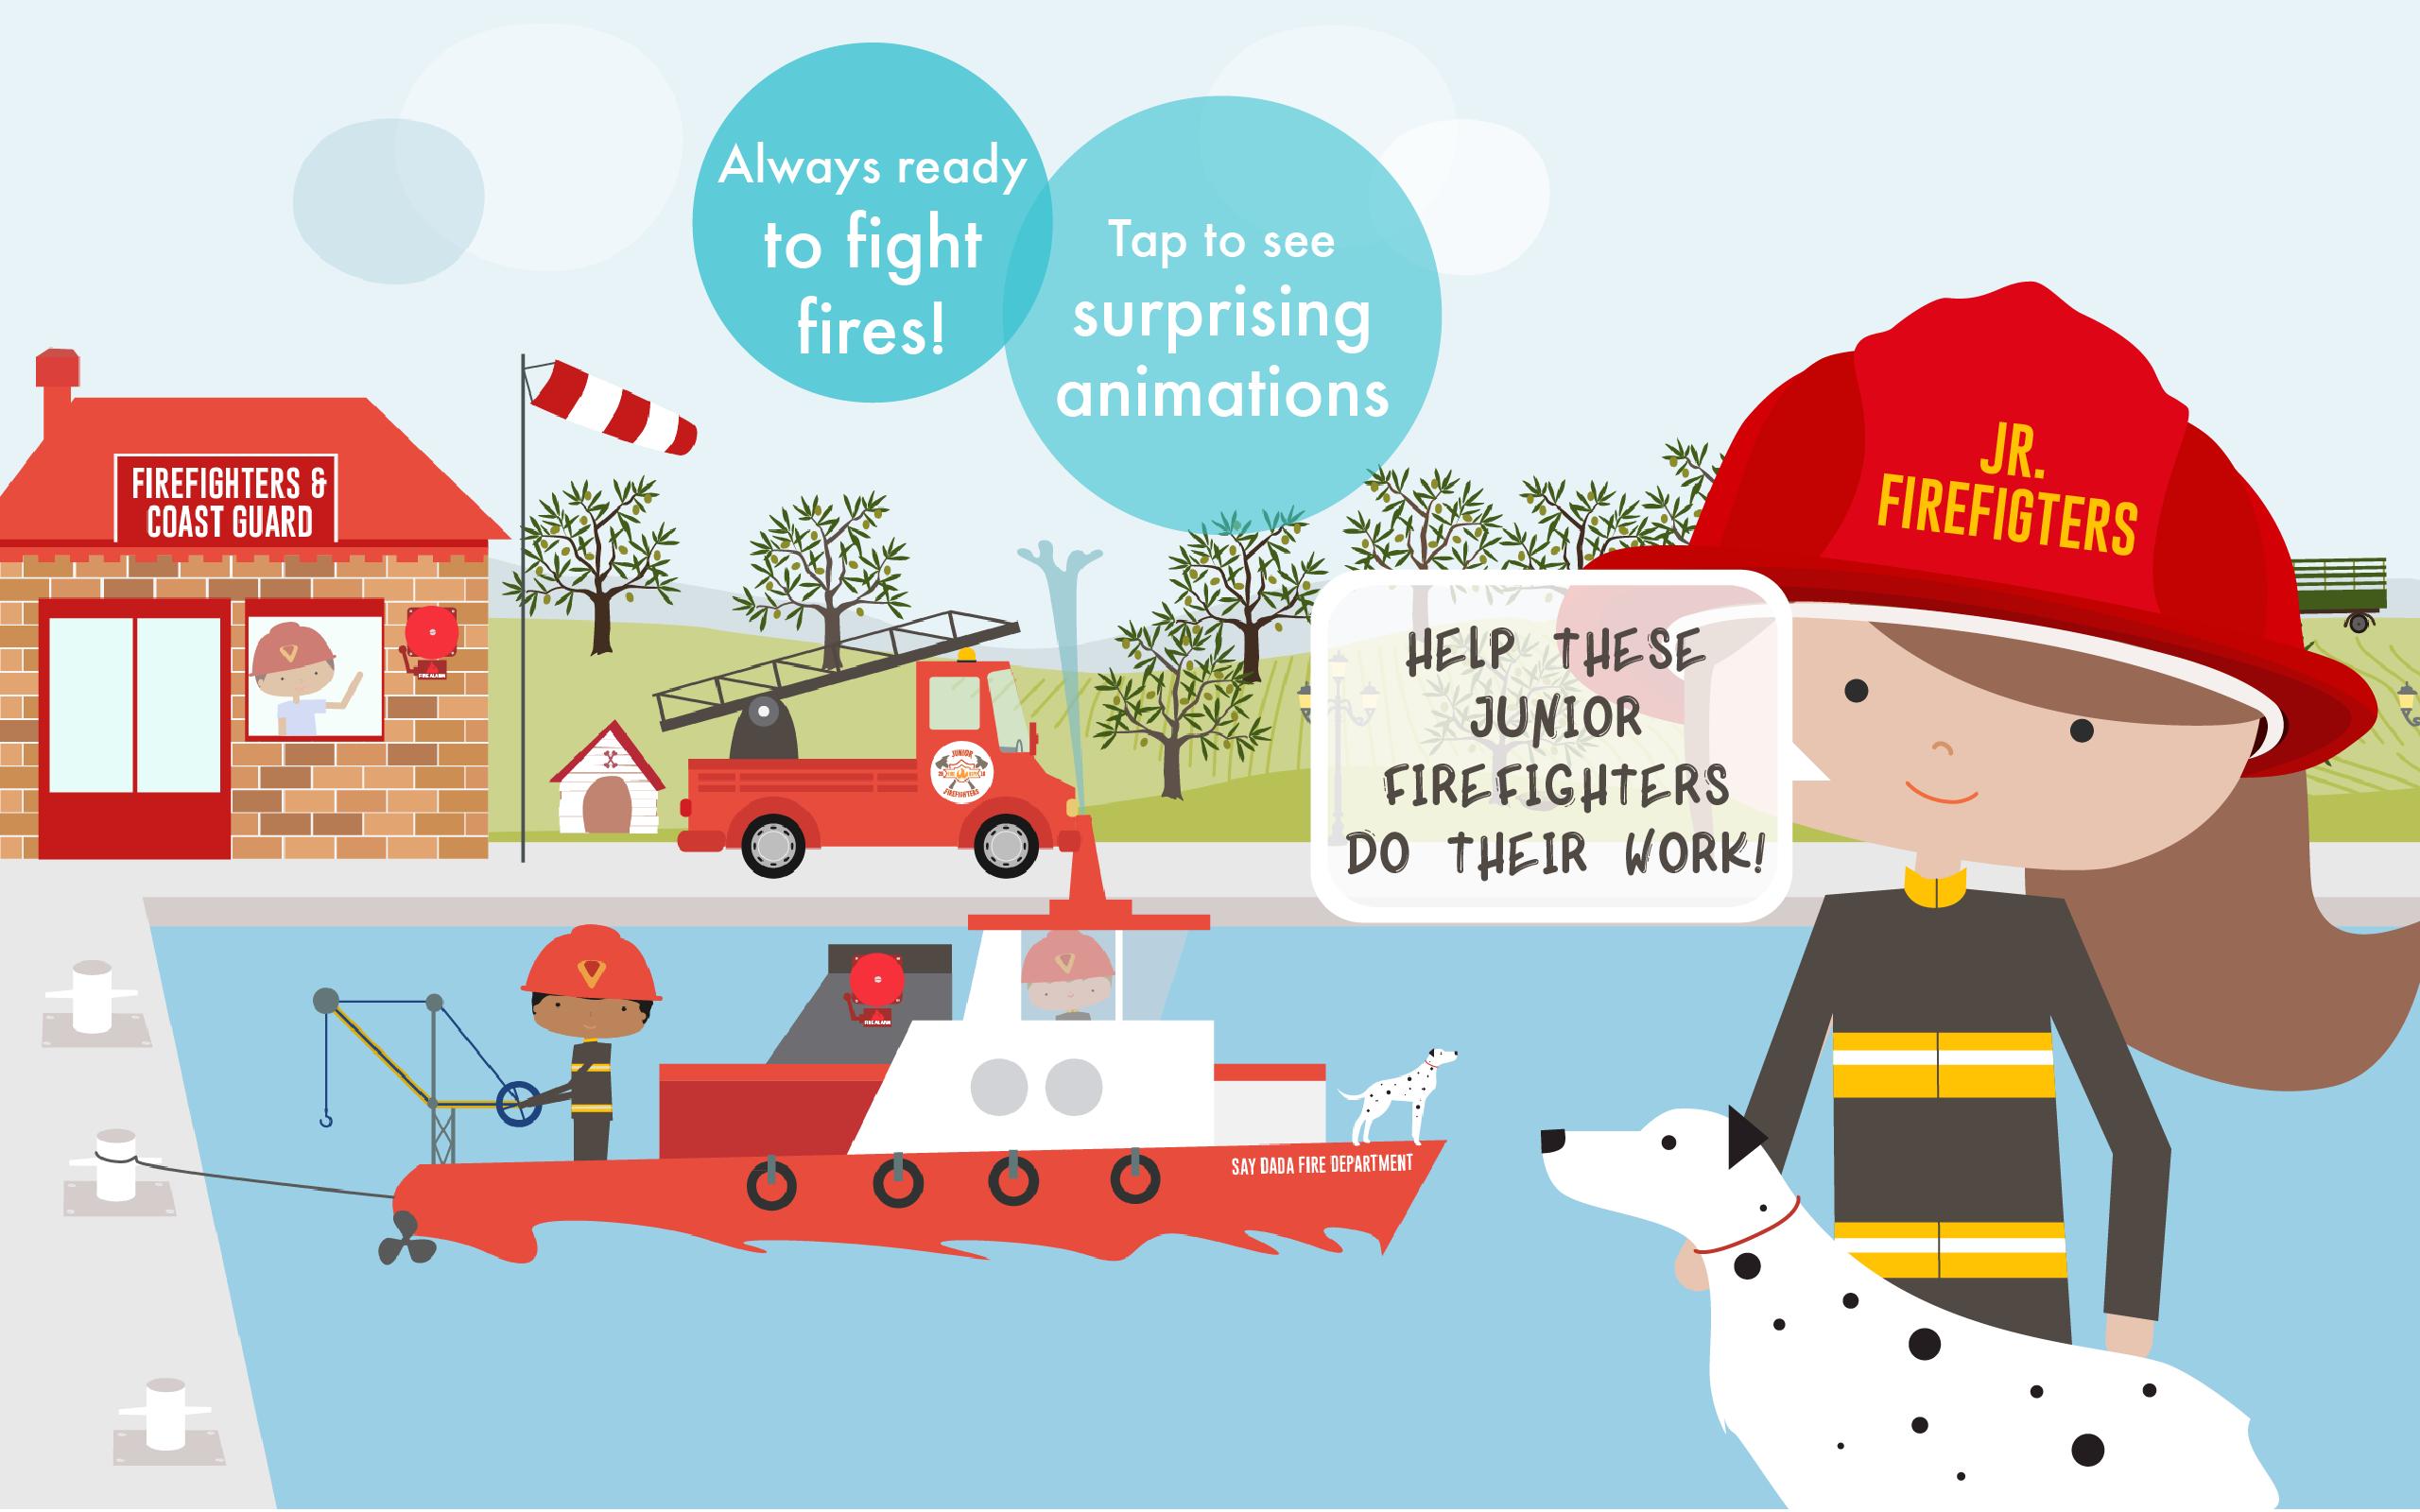 how to start a junior firefighter program